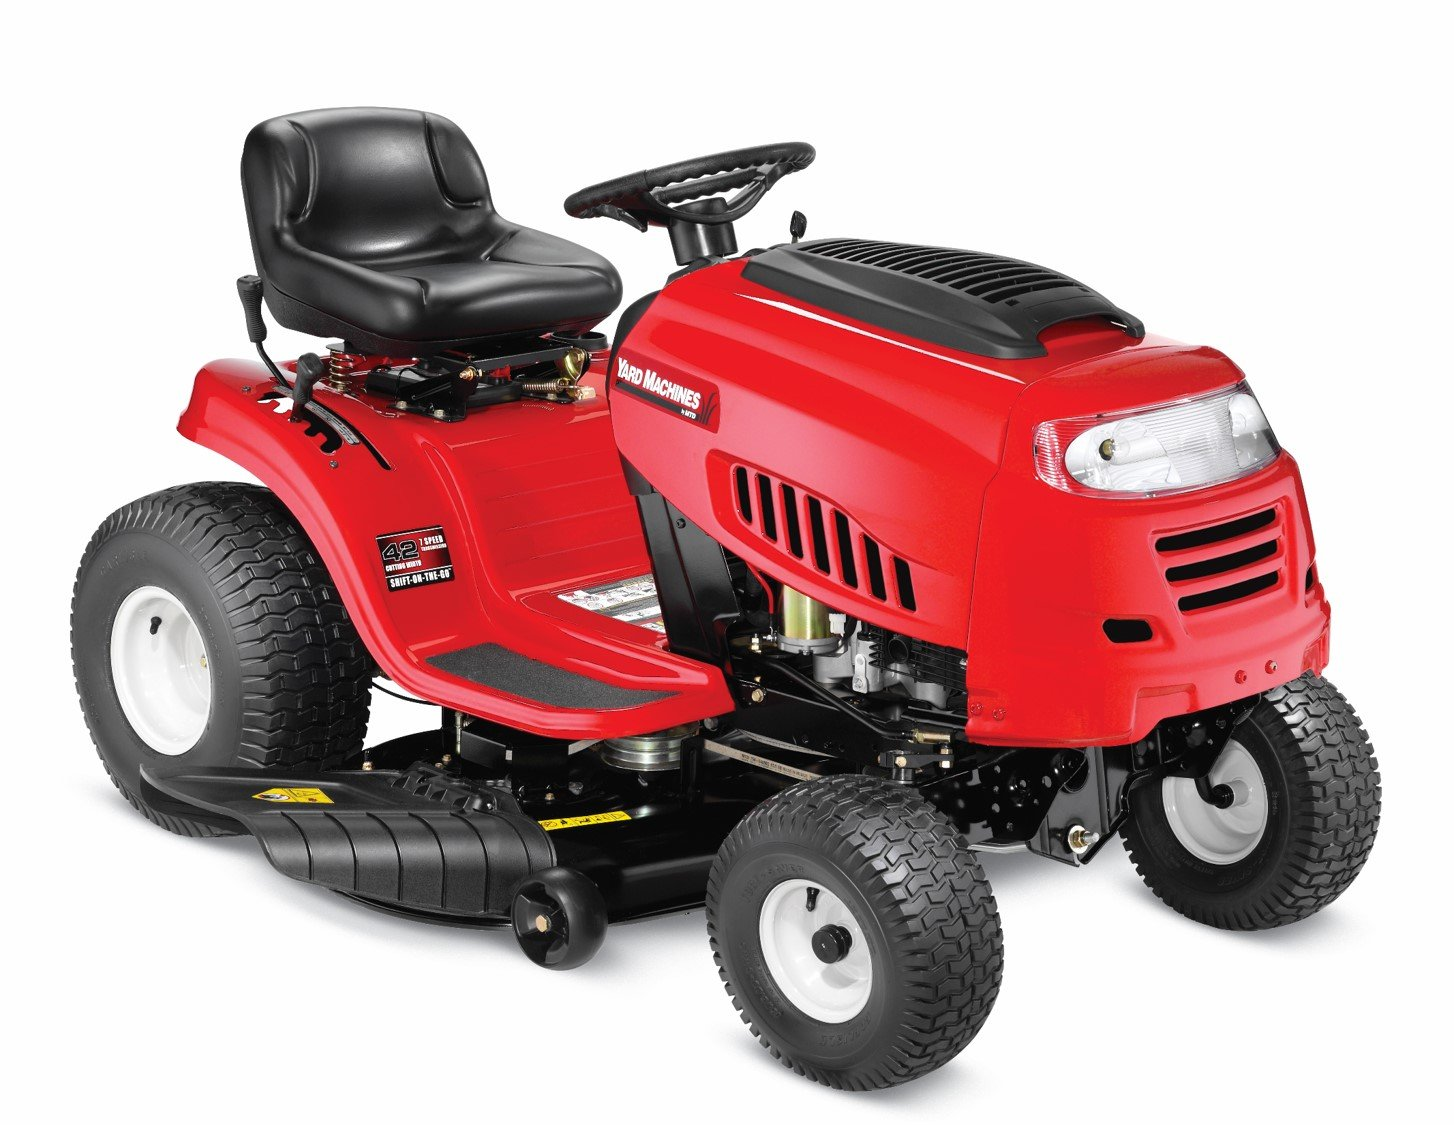 Amazon.com : Yard Machines 420cc 42-Inch Riding Lawn Tractor : Garden &  Outdoor